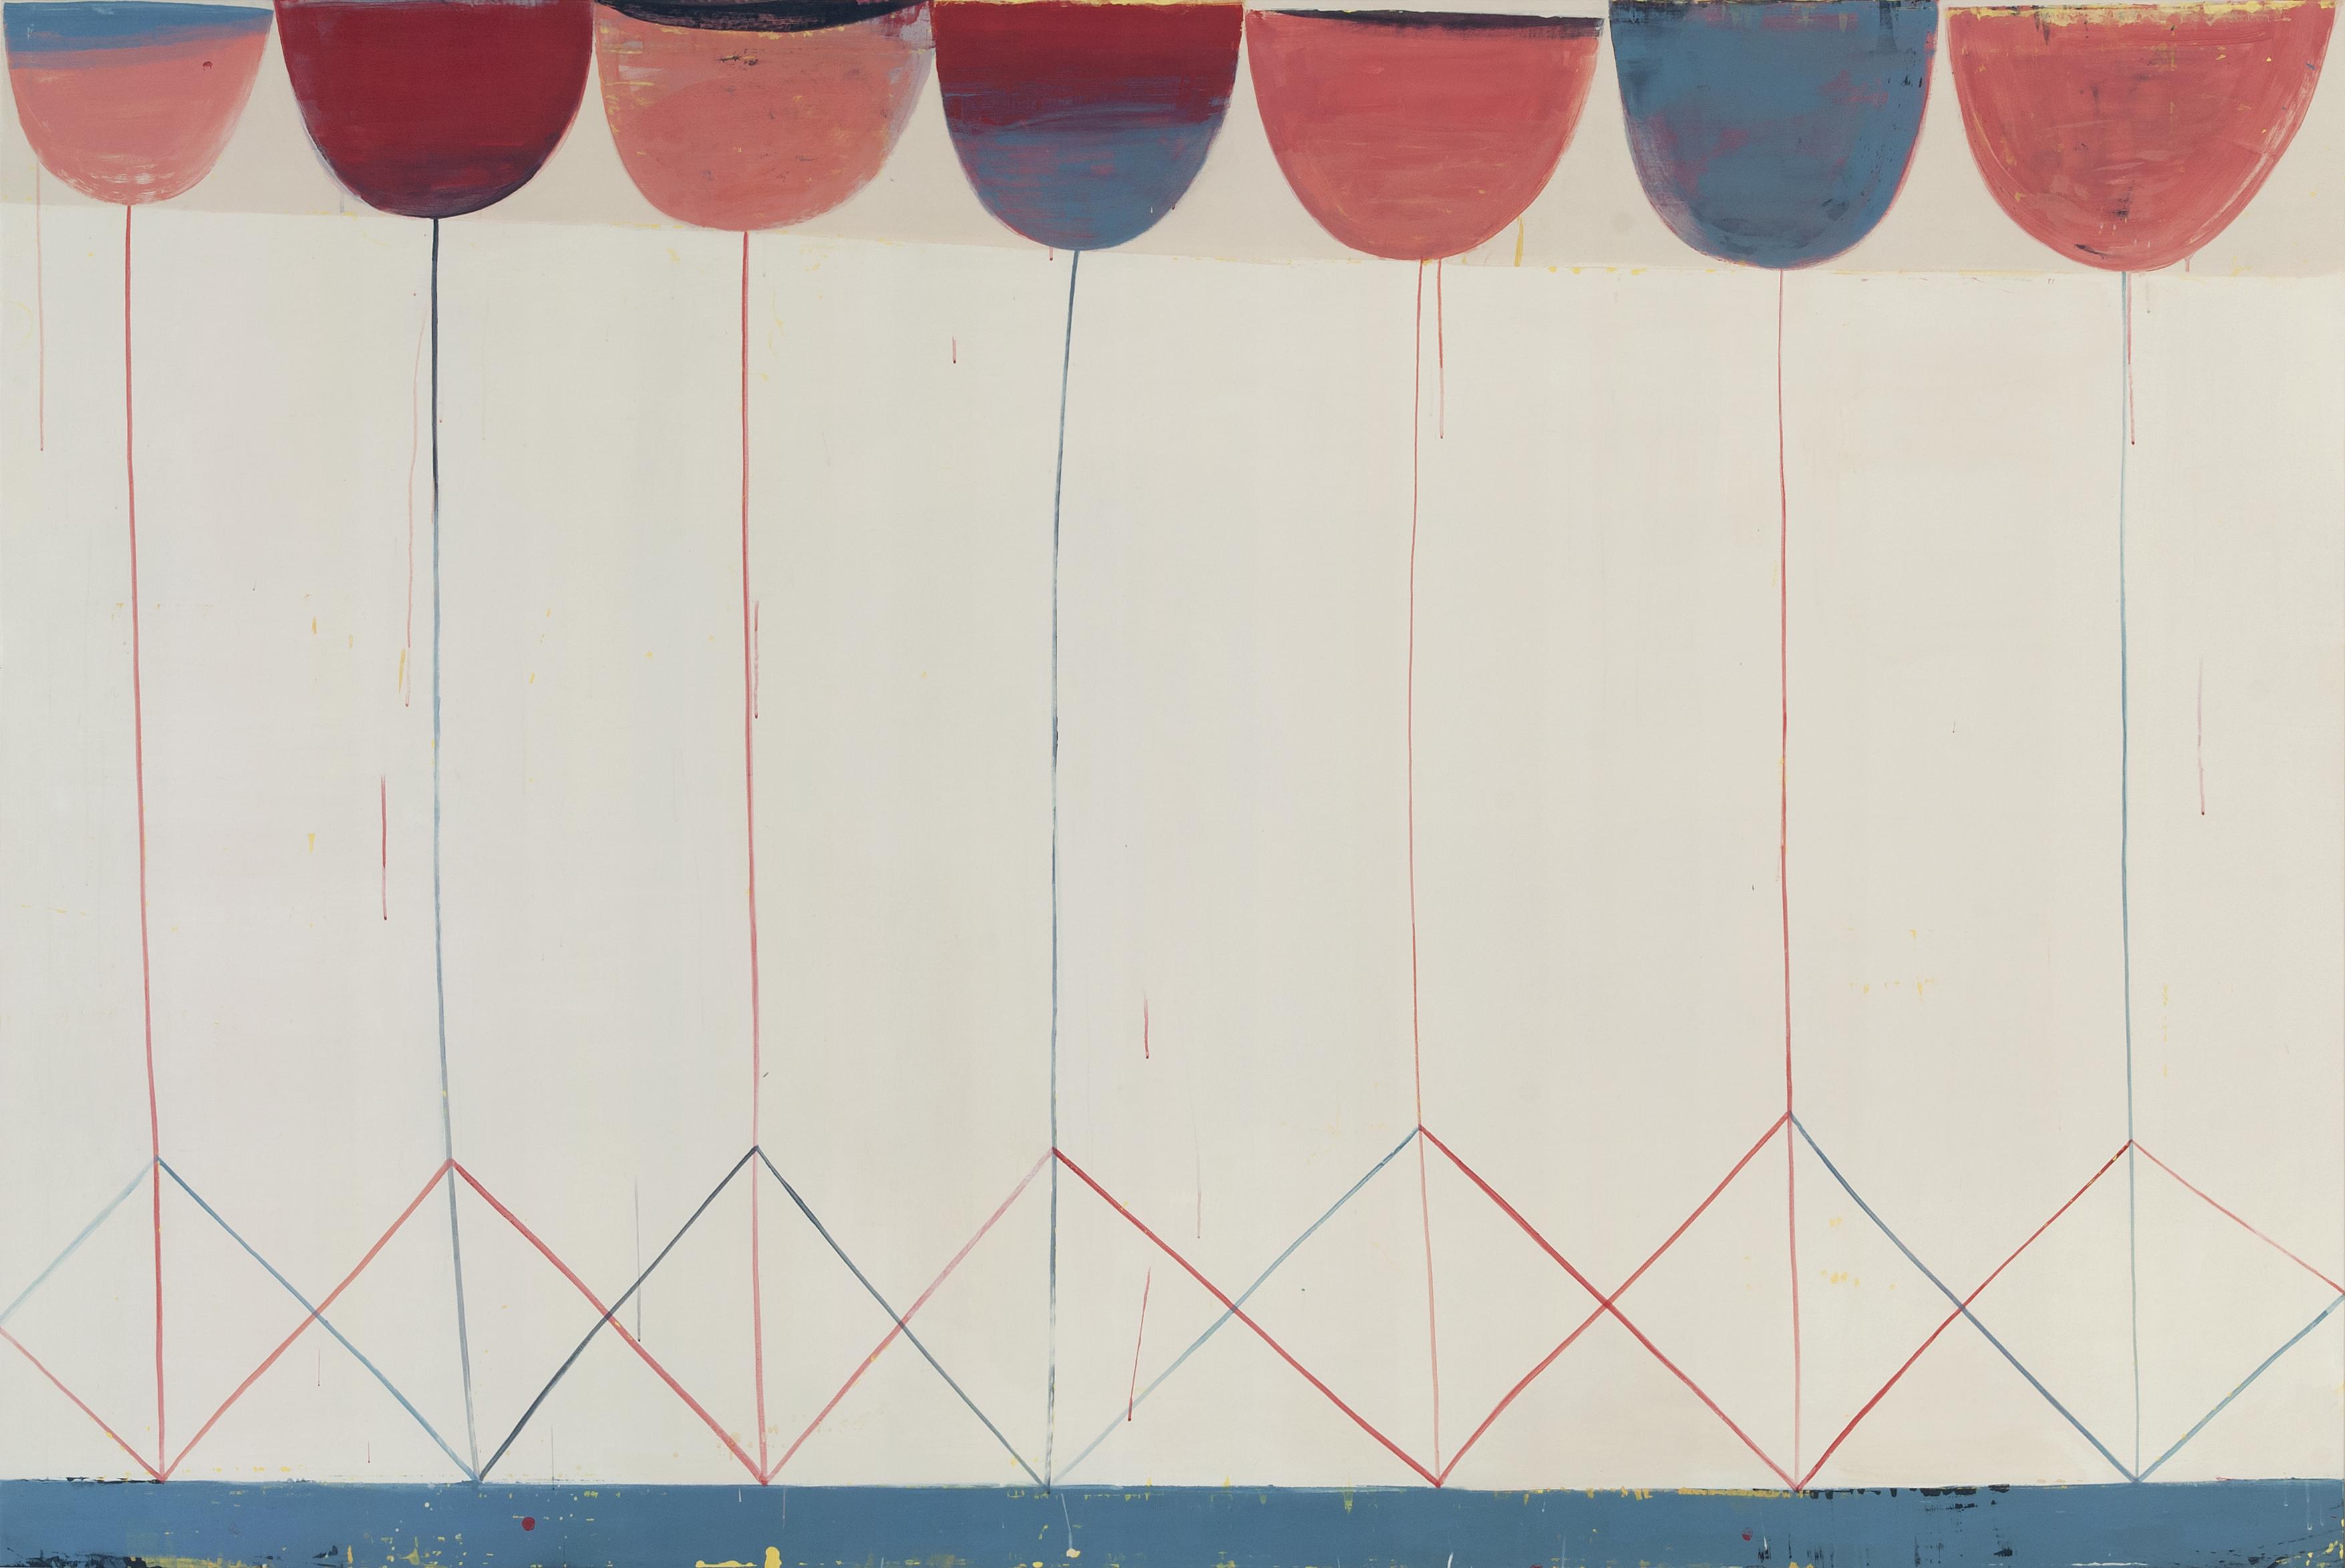 Sabine Finkenauer. Jardín, 2019. Acrílico sobre tela. 160 x 240 cm.